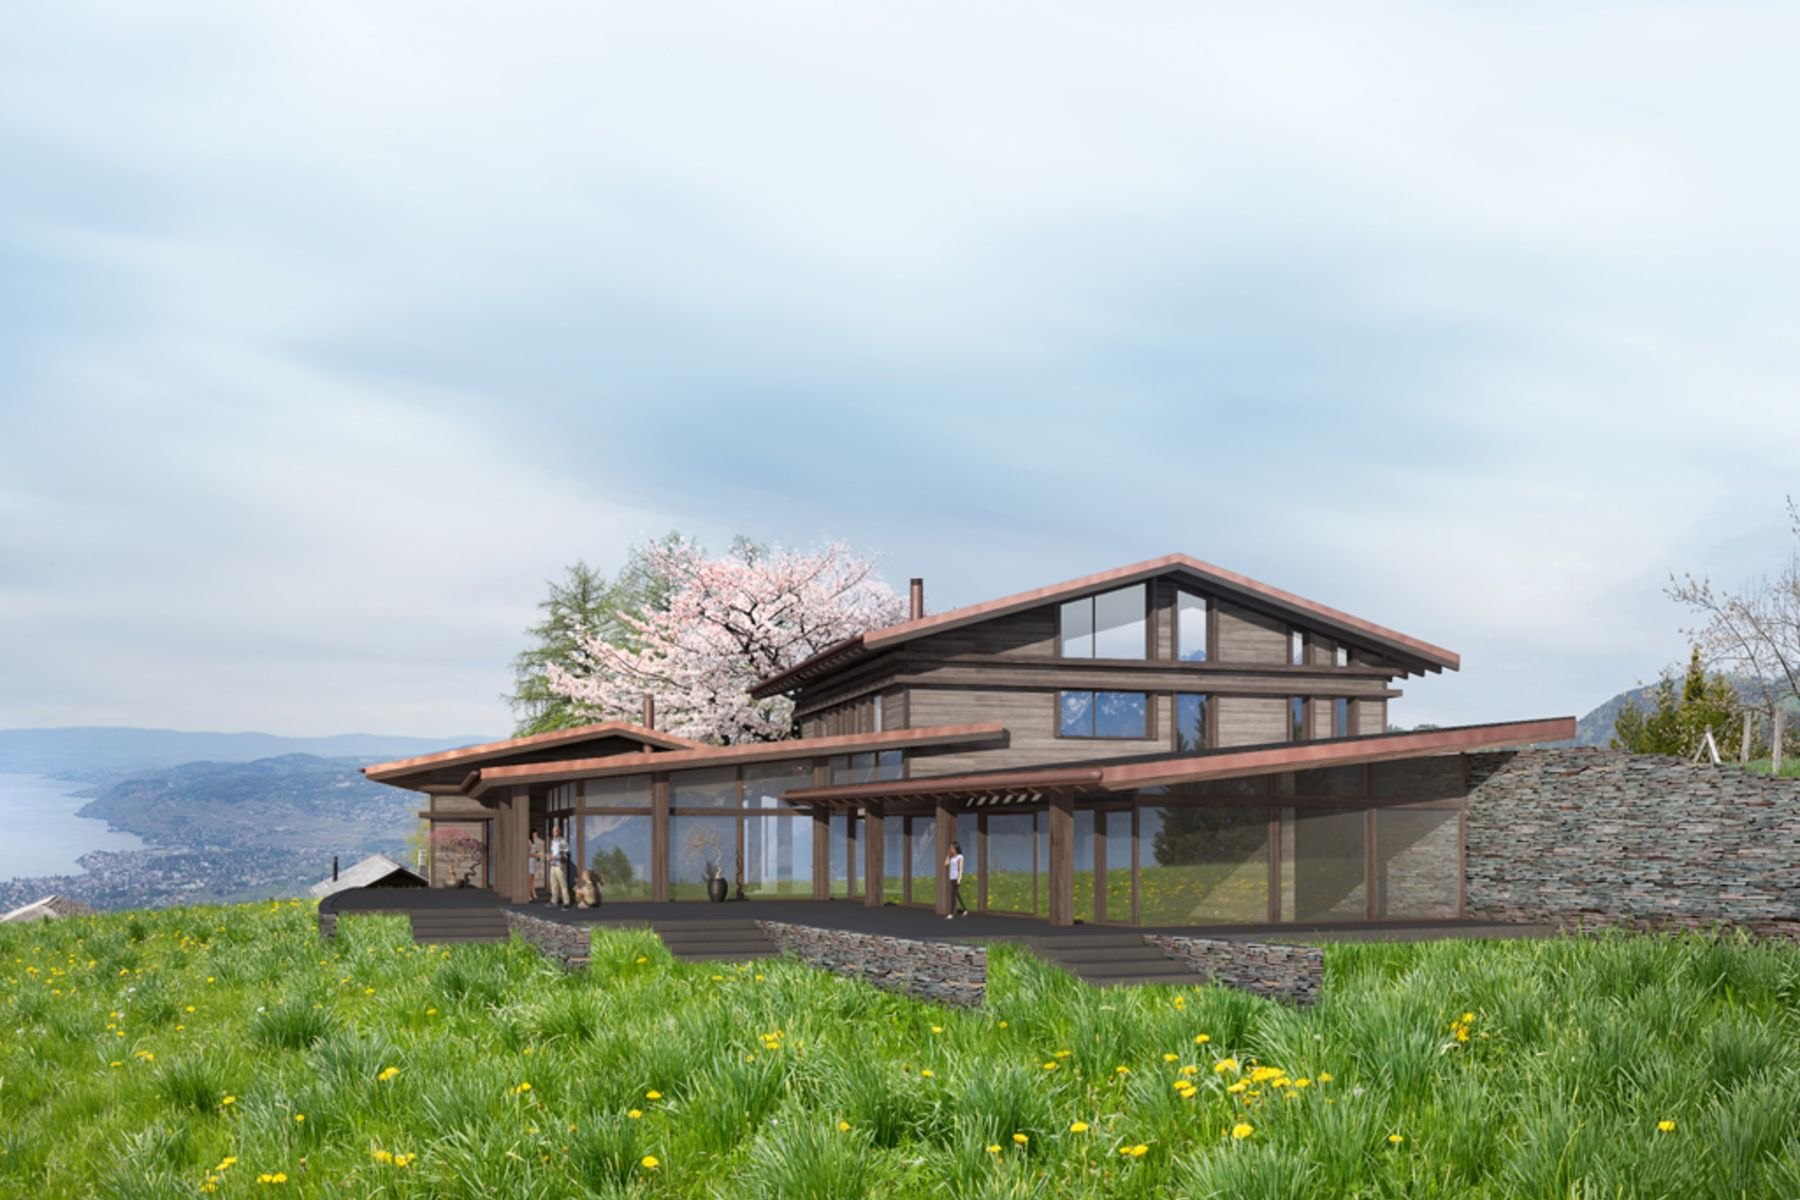 独户住宅 为 销售 在 Future property Luxurious layout Unique 360° panoramic view Caux/Montreux 蒙特勒, 沃州, 1820 瑞士